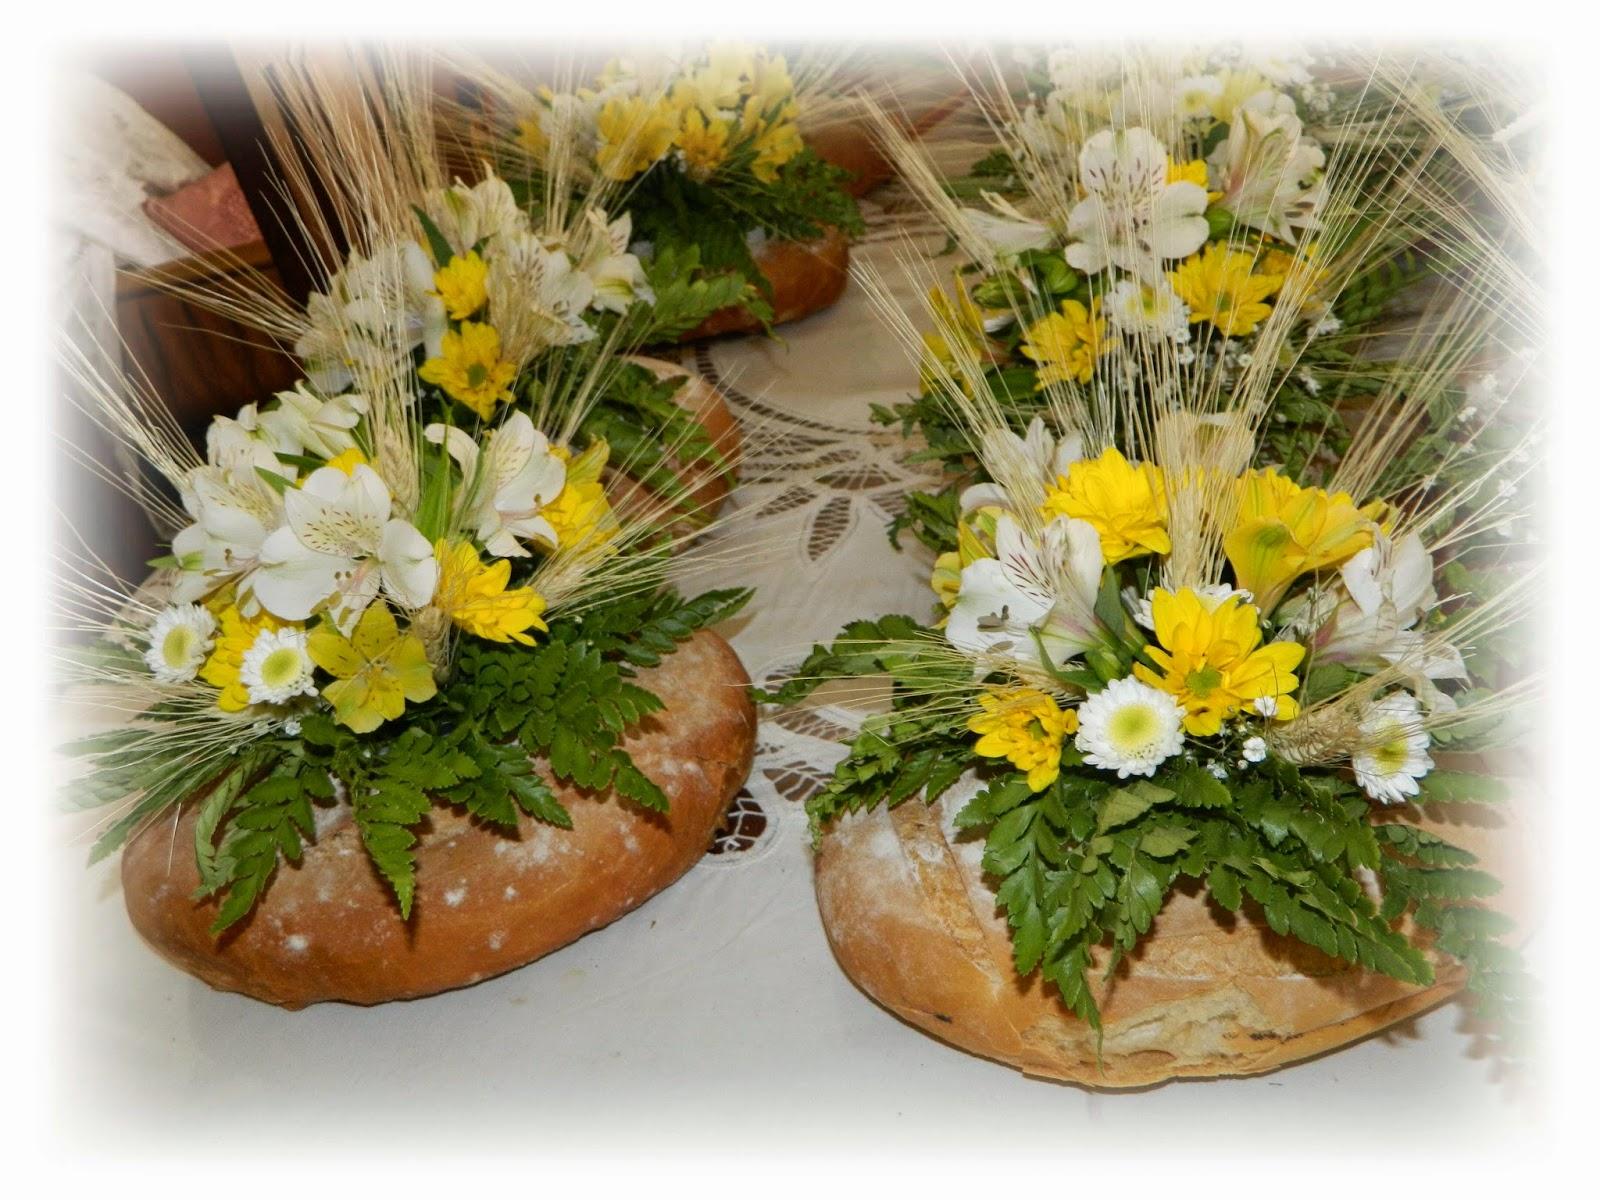 Centro d mesa d panes d ali creaciones noviembre 2012 for Mesa verona conforama